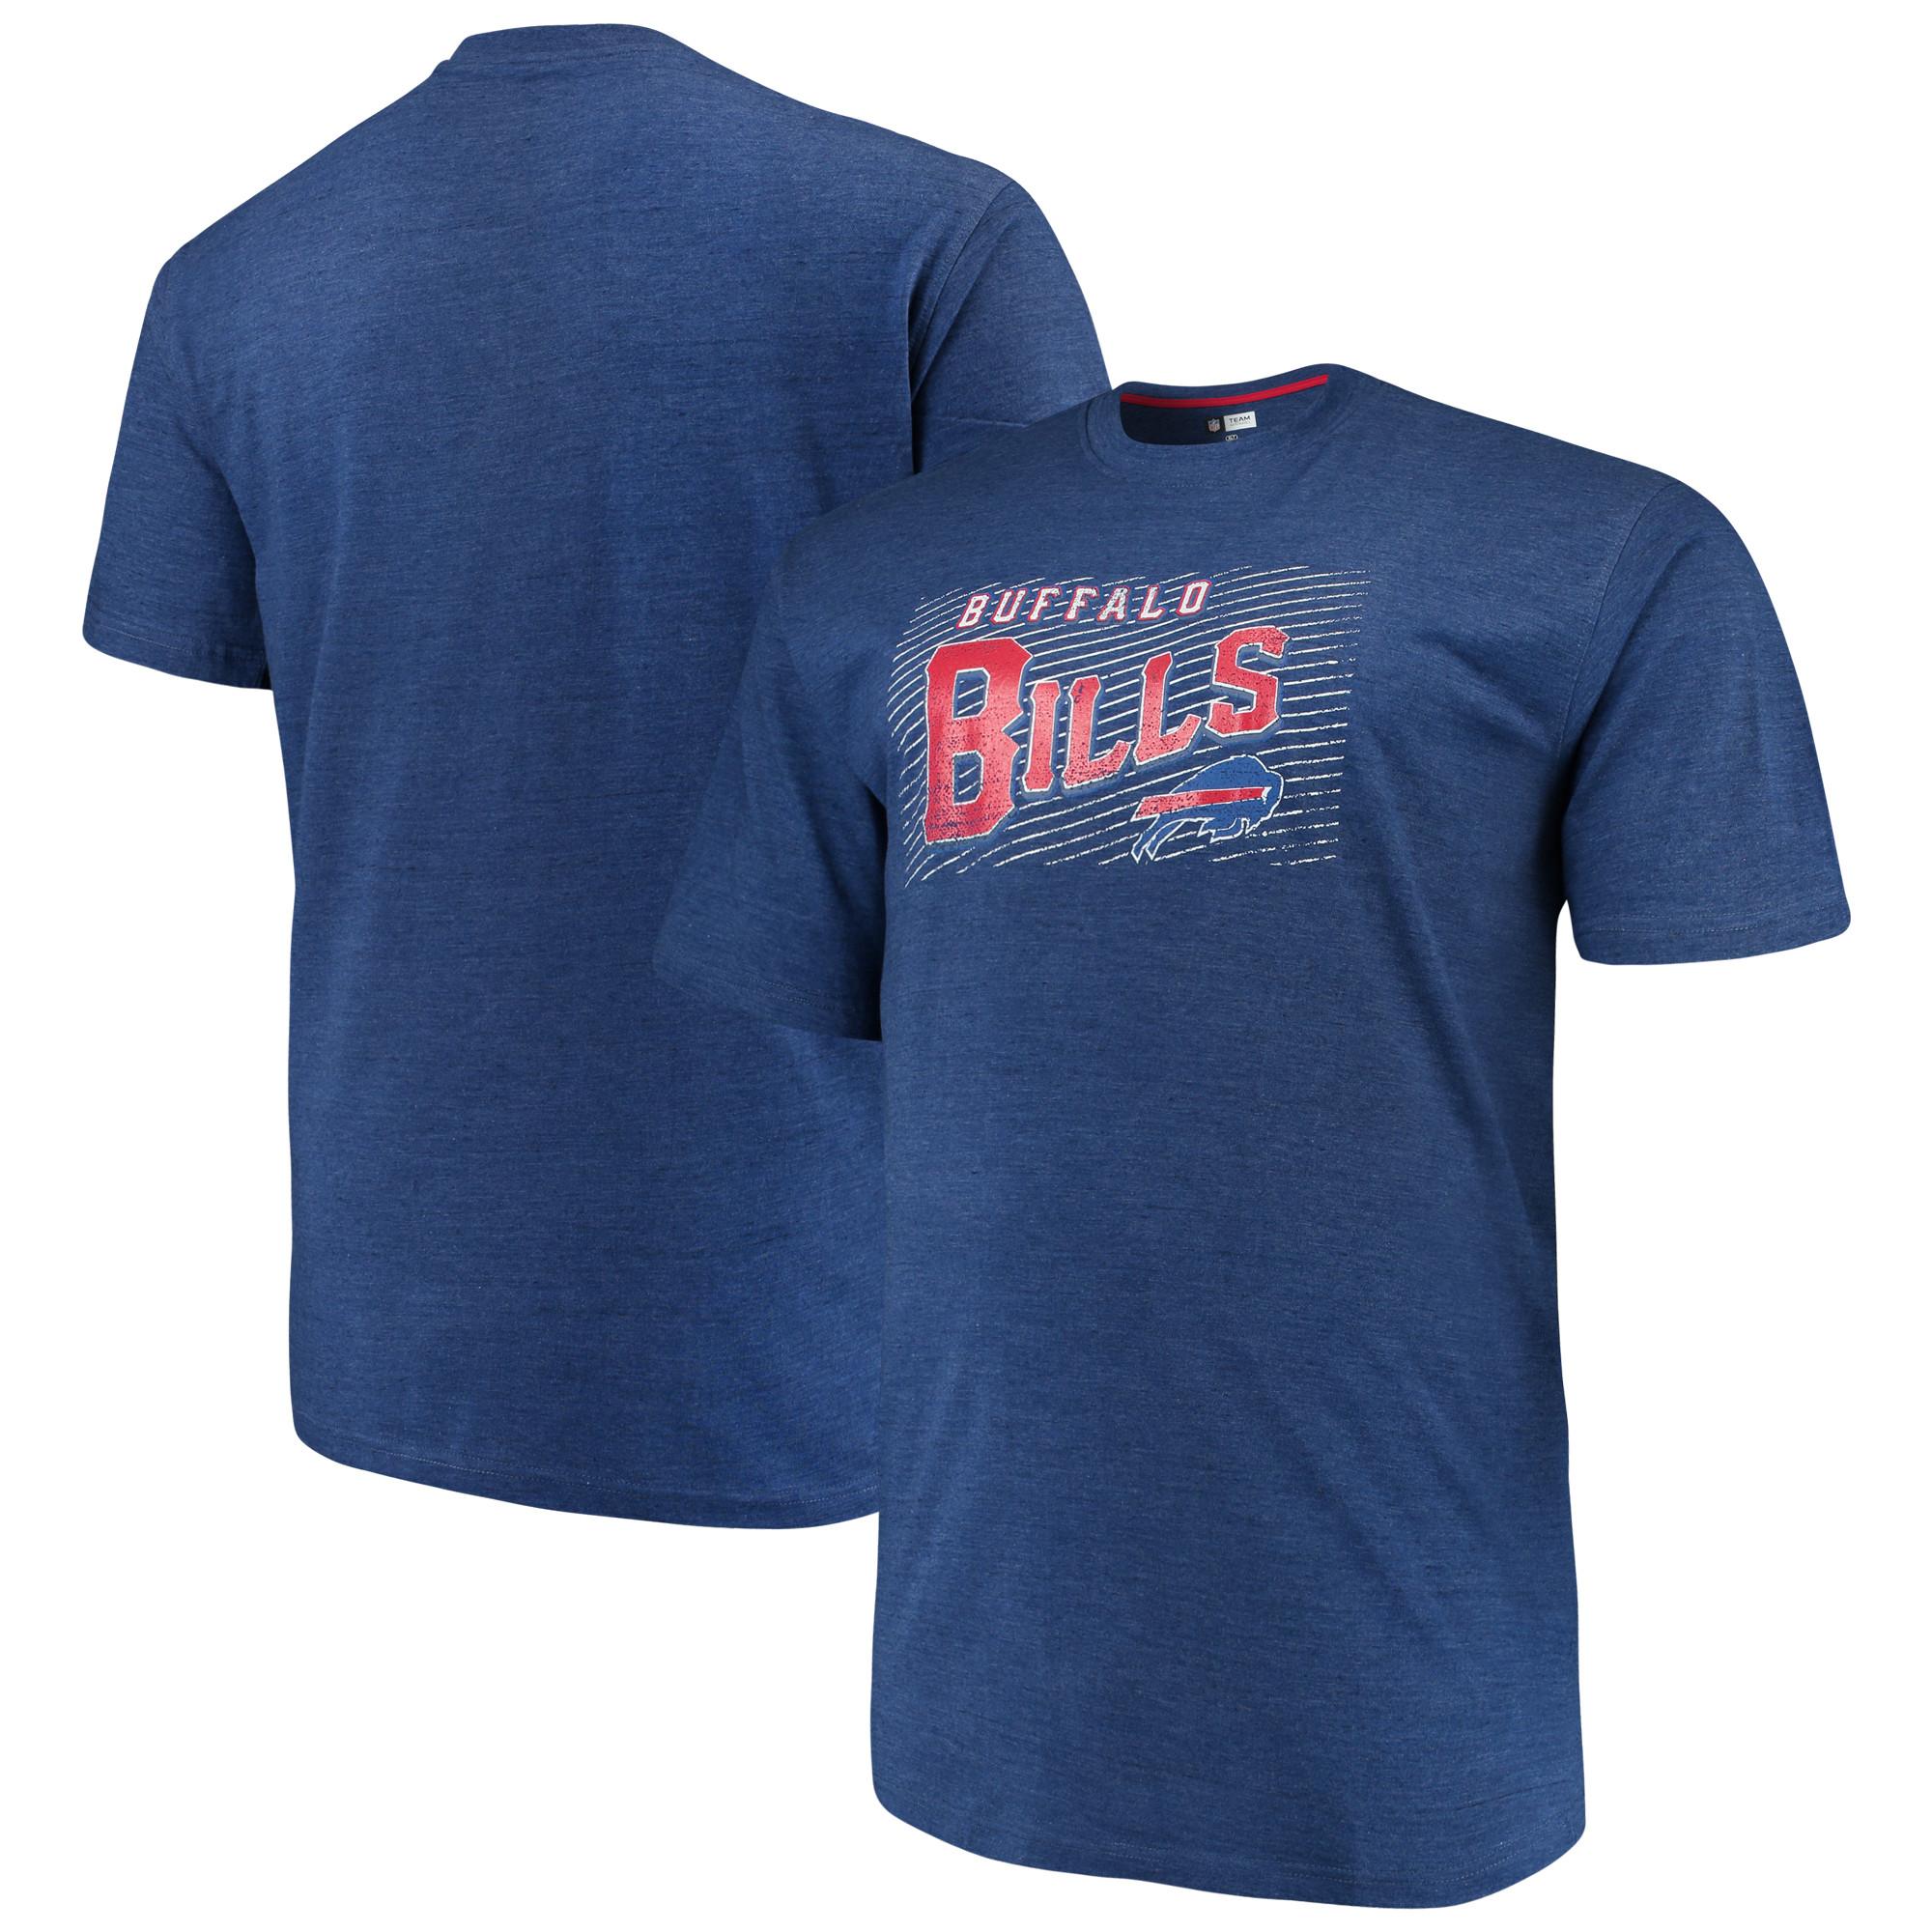 Men's Majestic Royal Buffalo Bills Big & Tall Royal Domination Malt T-Shirt